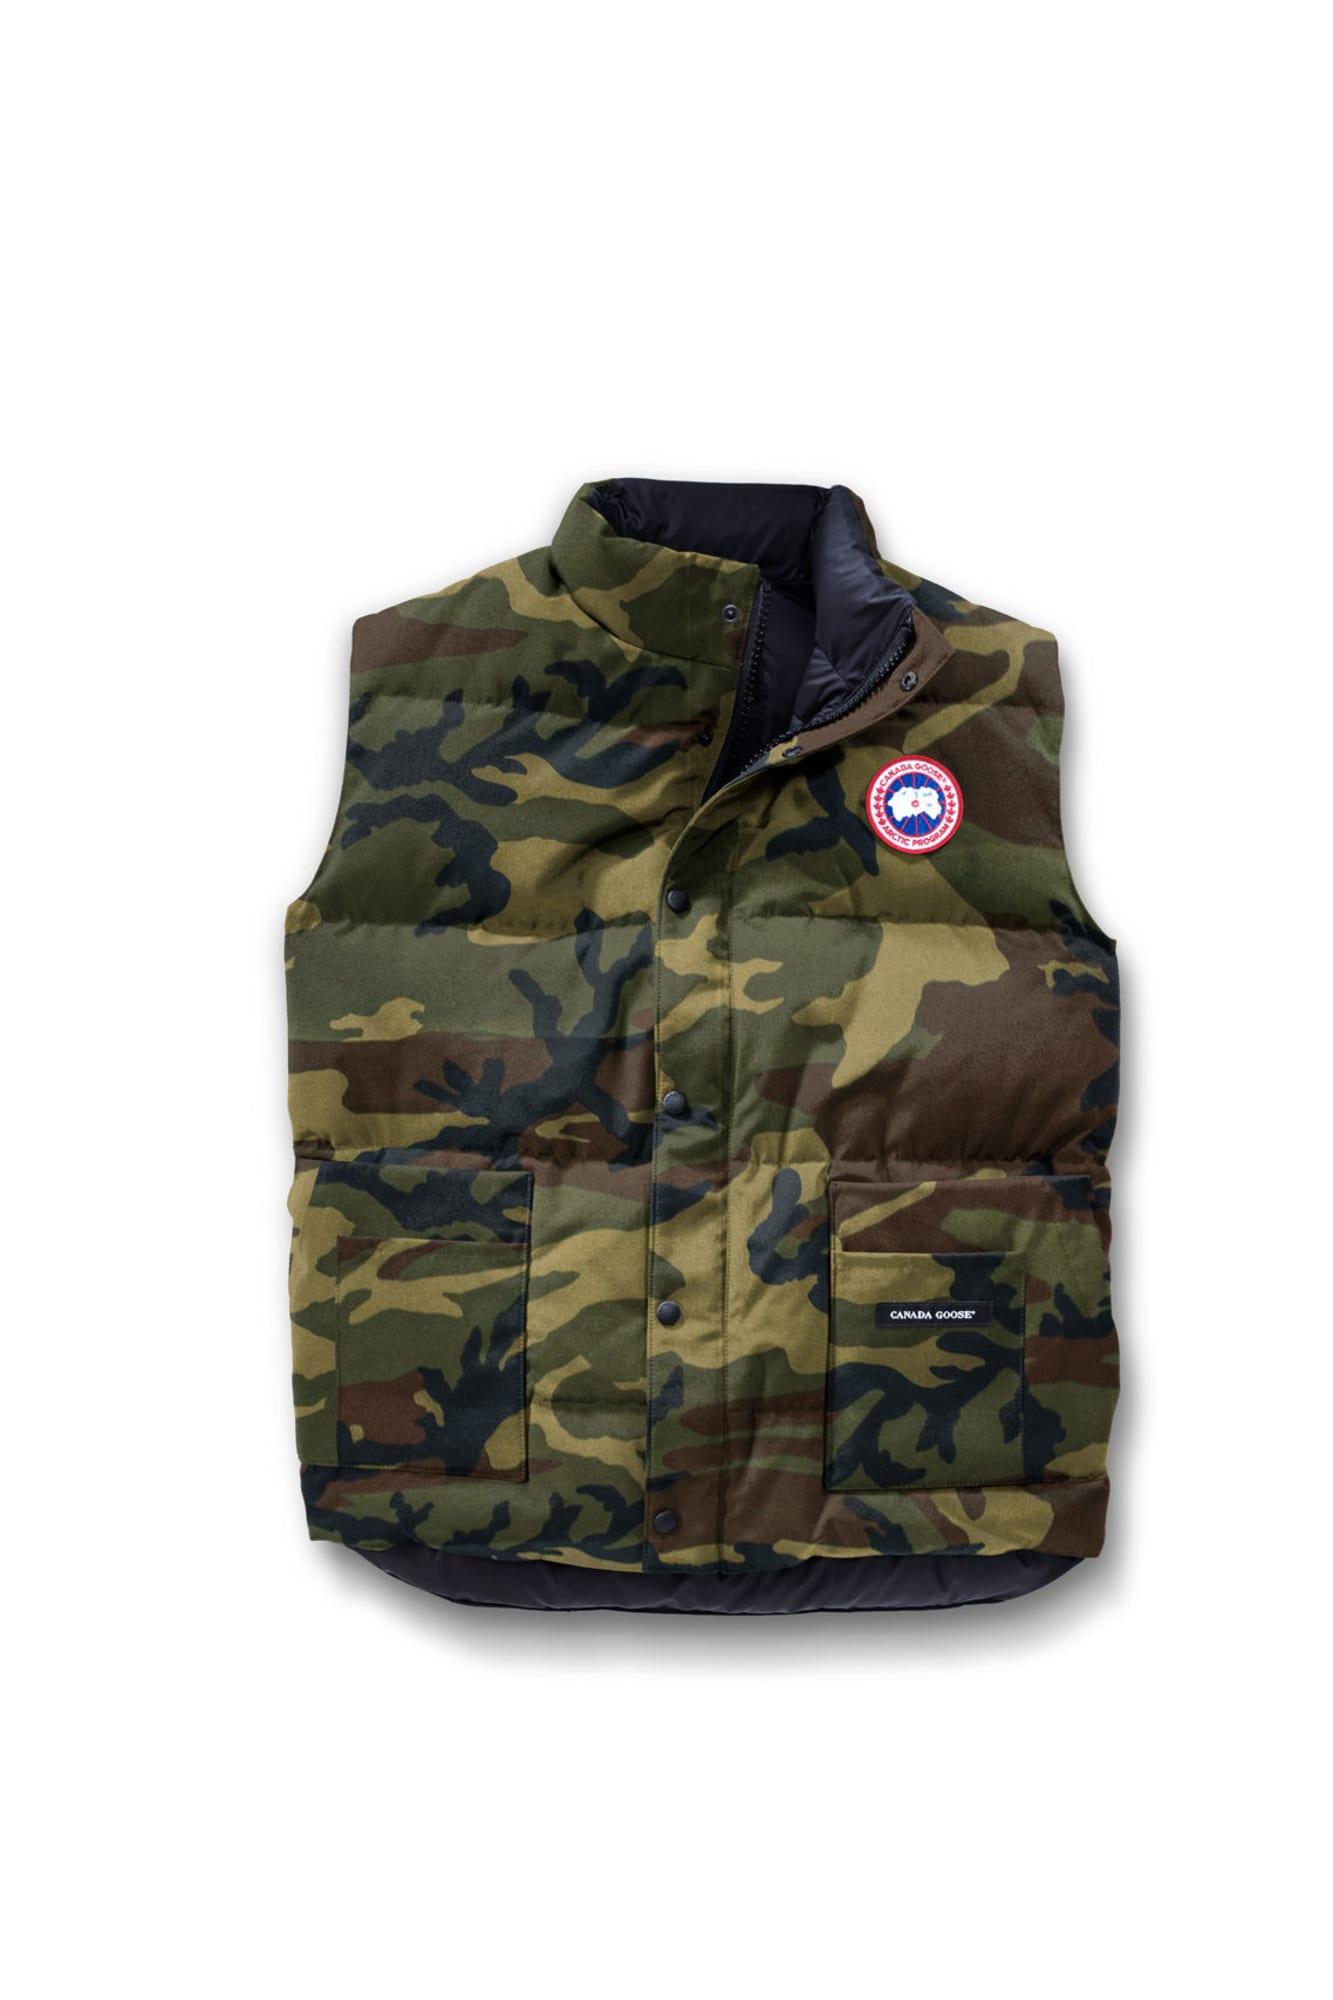 ddcbde446b57 Freestyle Vest